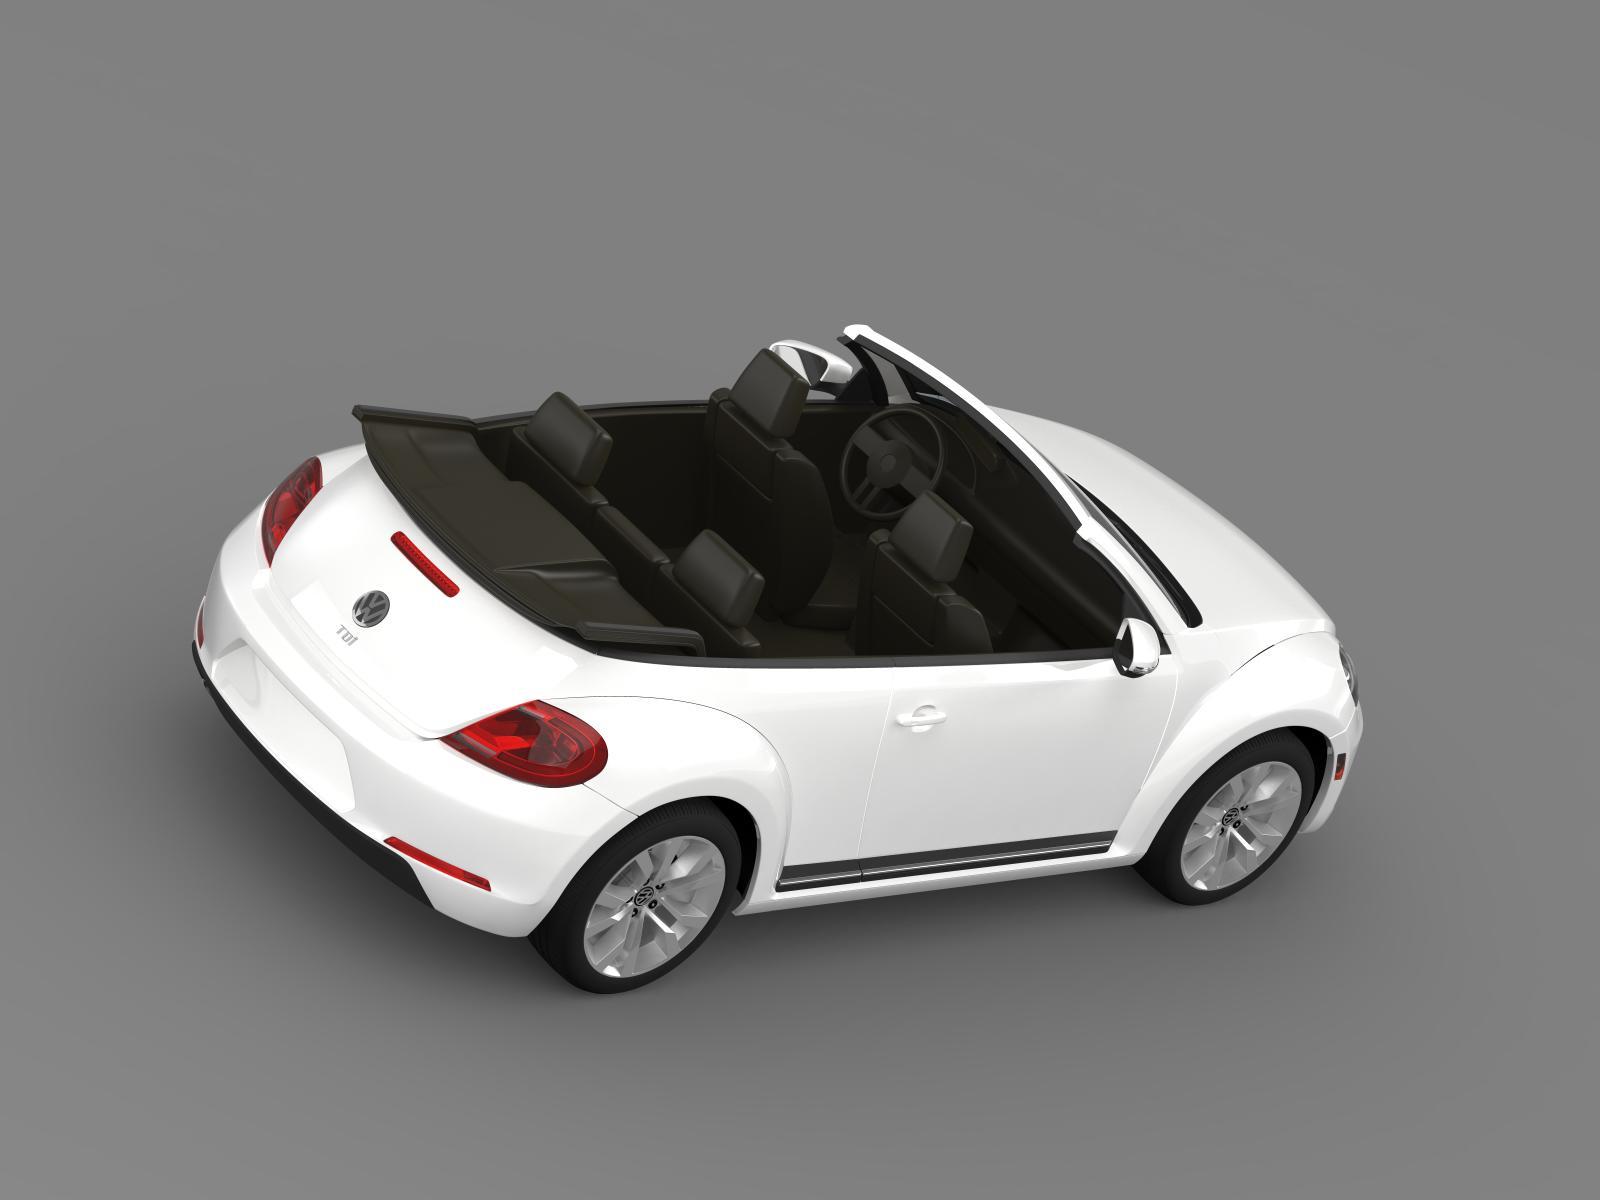 vw beetle tdi cabrio 2014 3d model. Black Bedroom Furniture Sets. Home Design Ideas